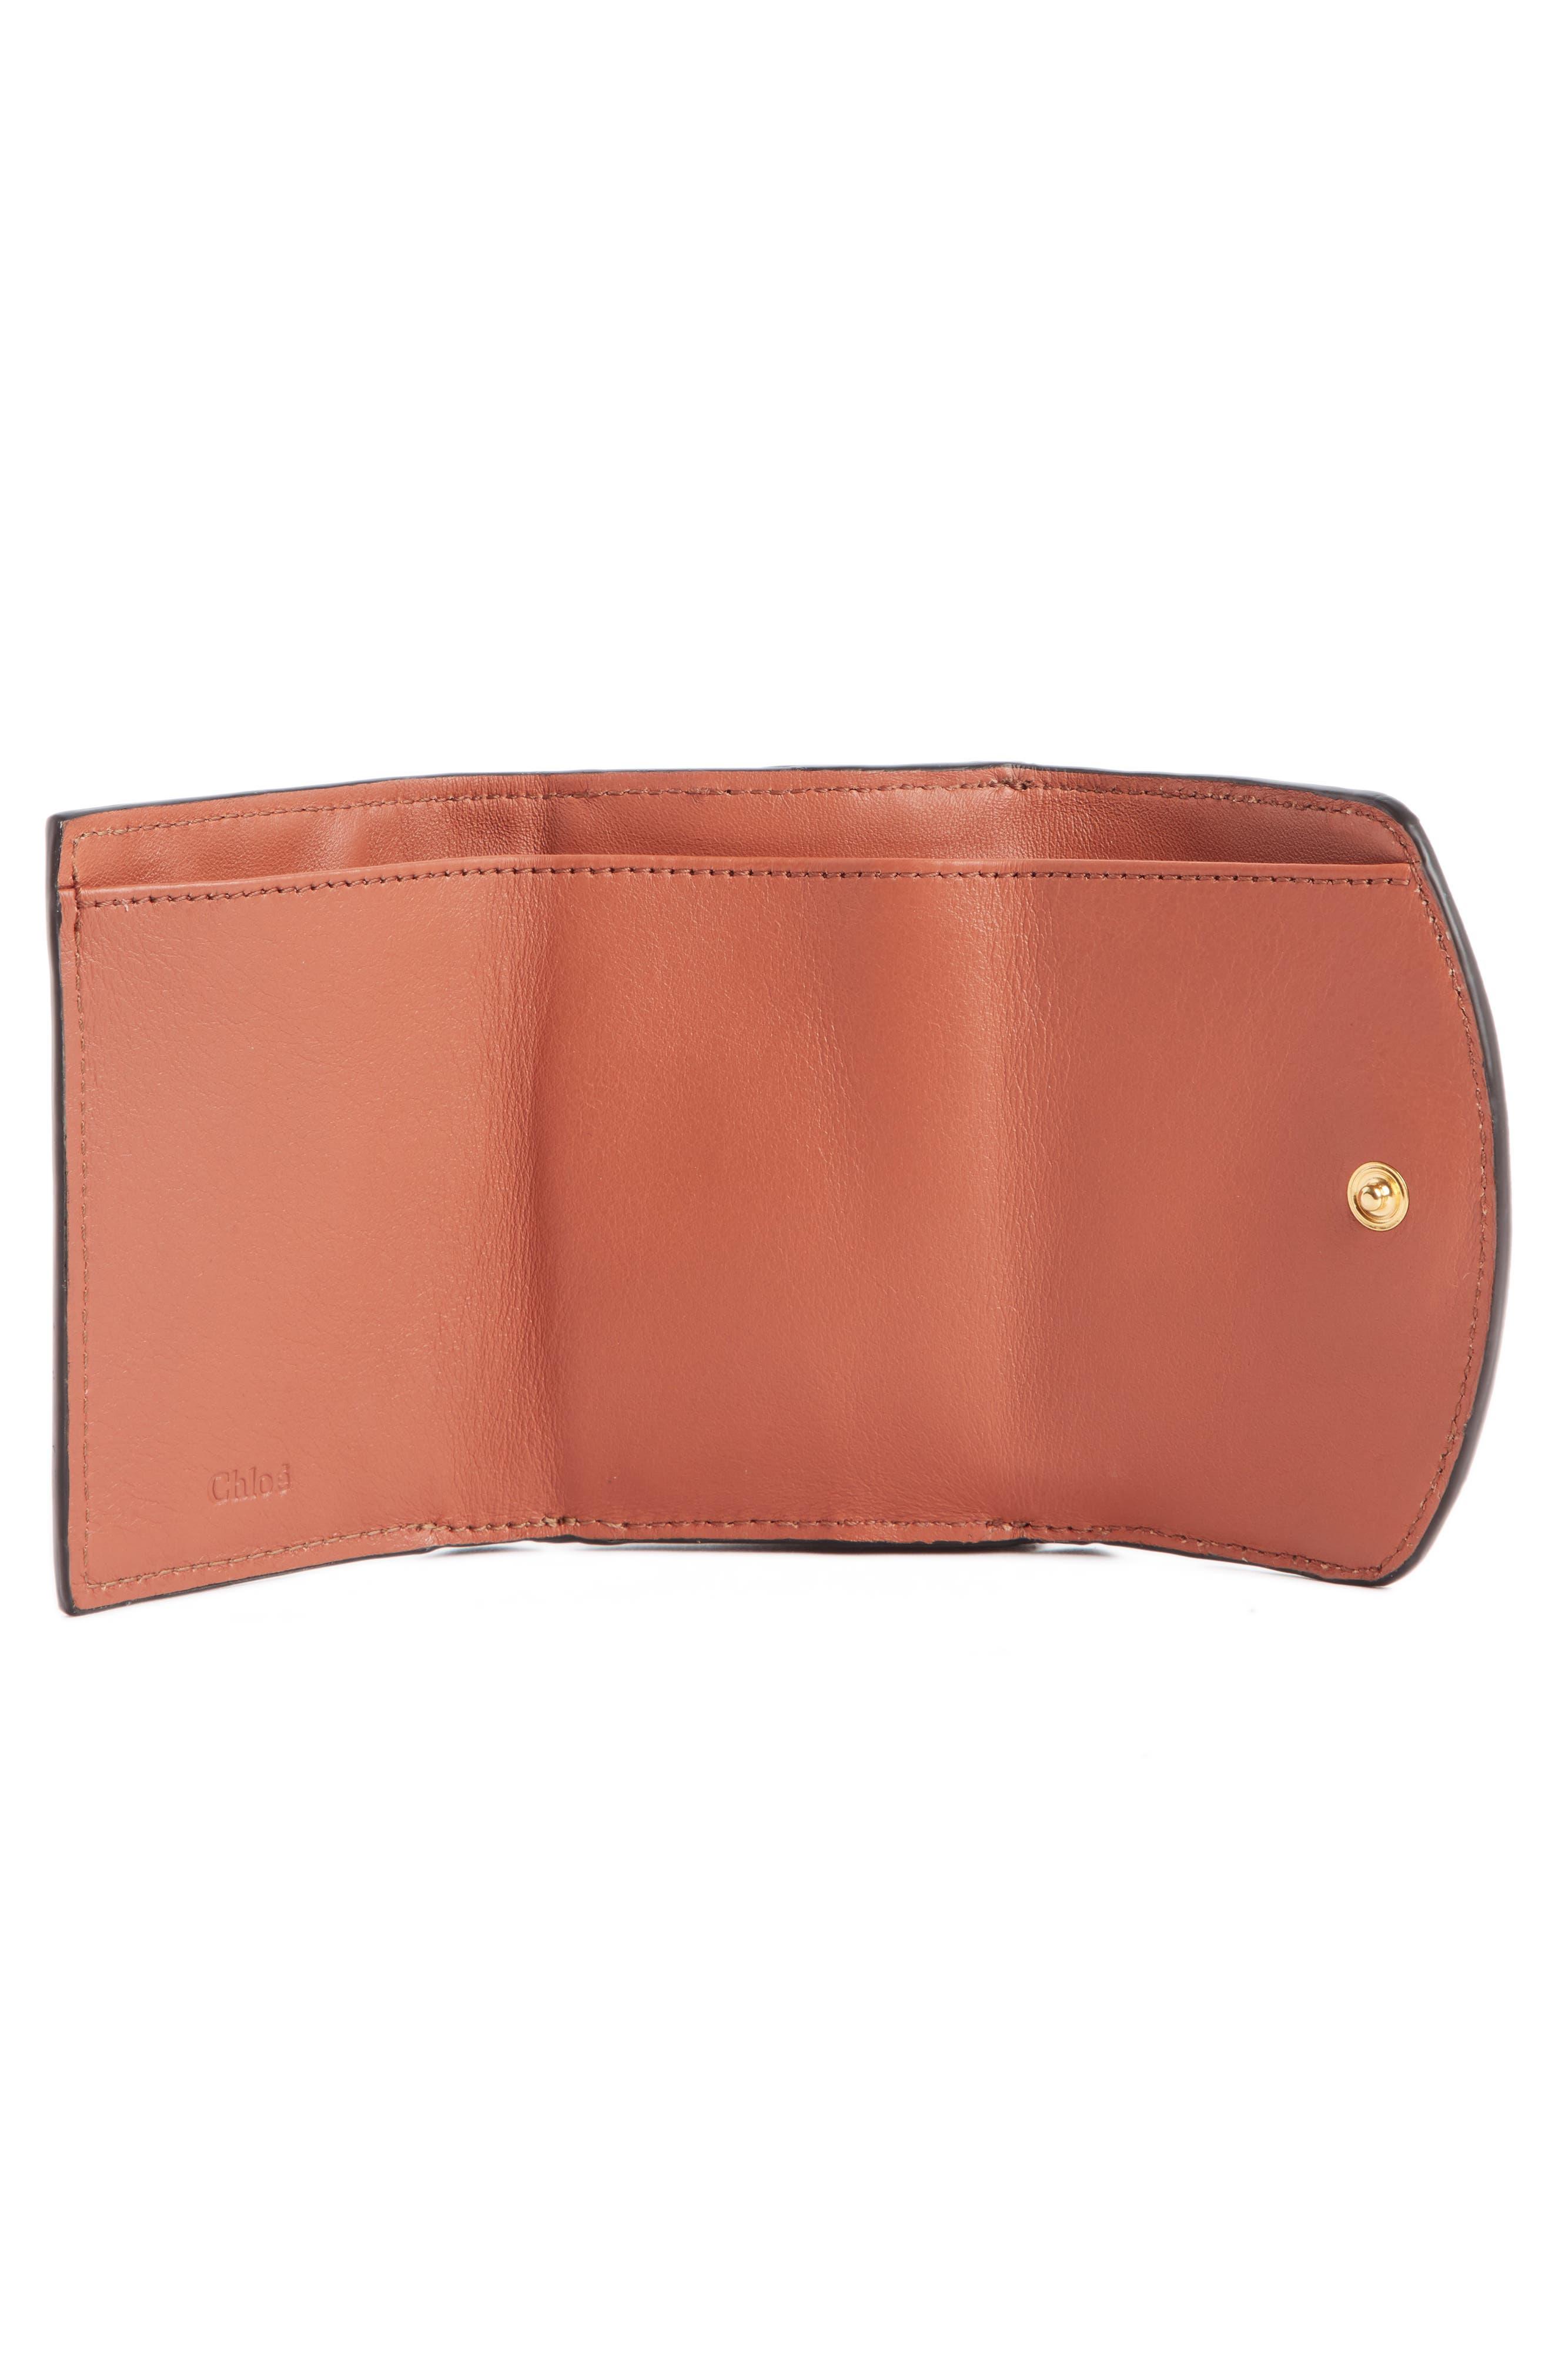 CHLOÉ,                             Mini-C Croc Embossed Leather Wallet,                             Alternate thumbnail 2, color,                             CHESTNUT BROWN